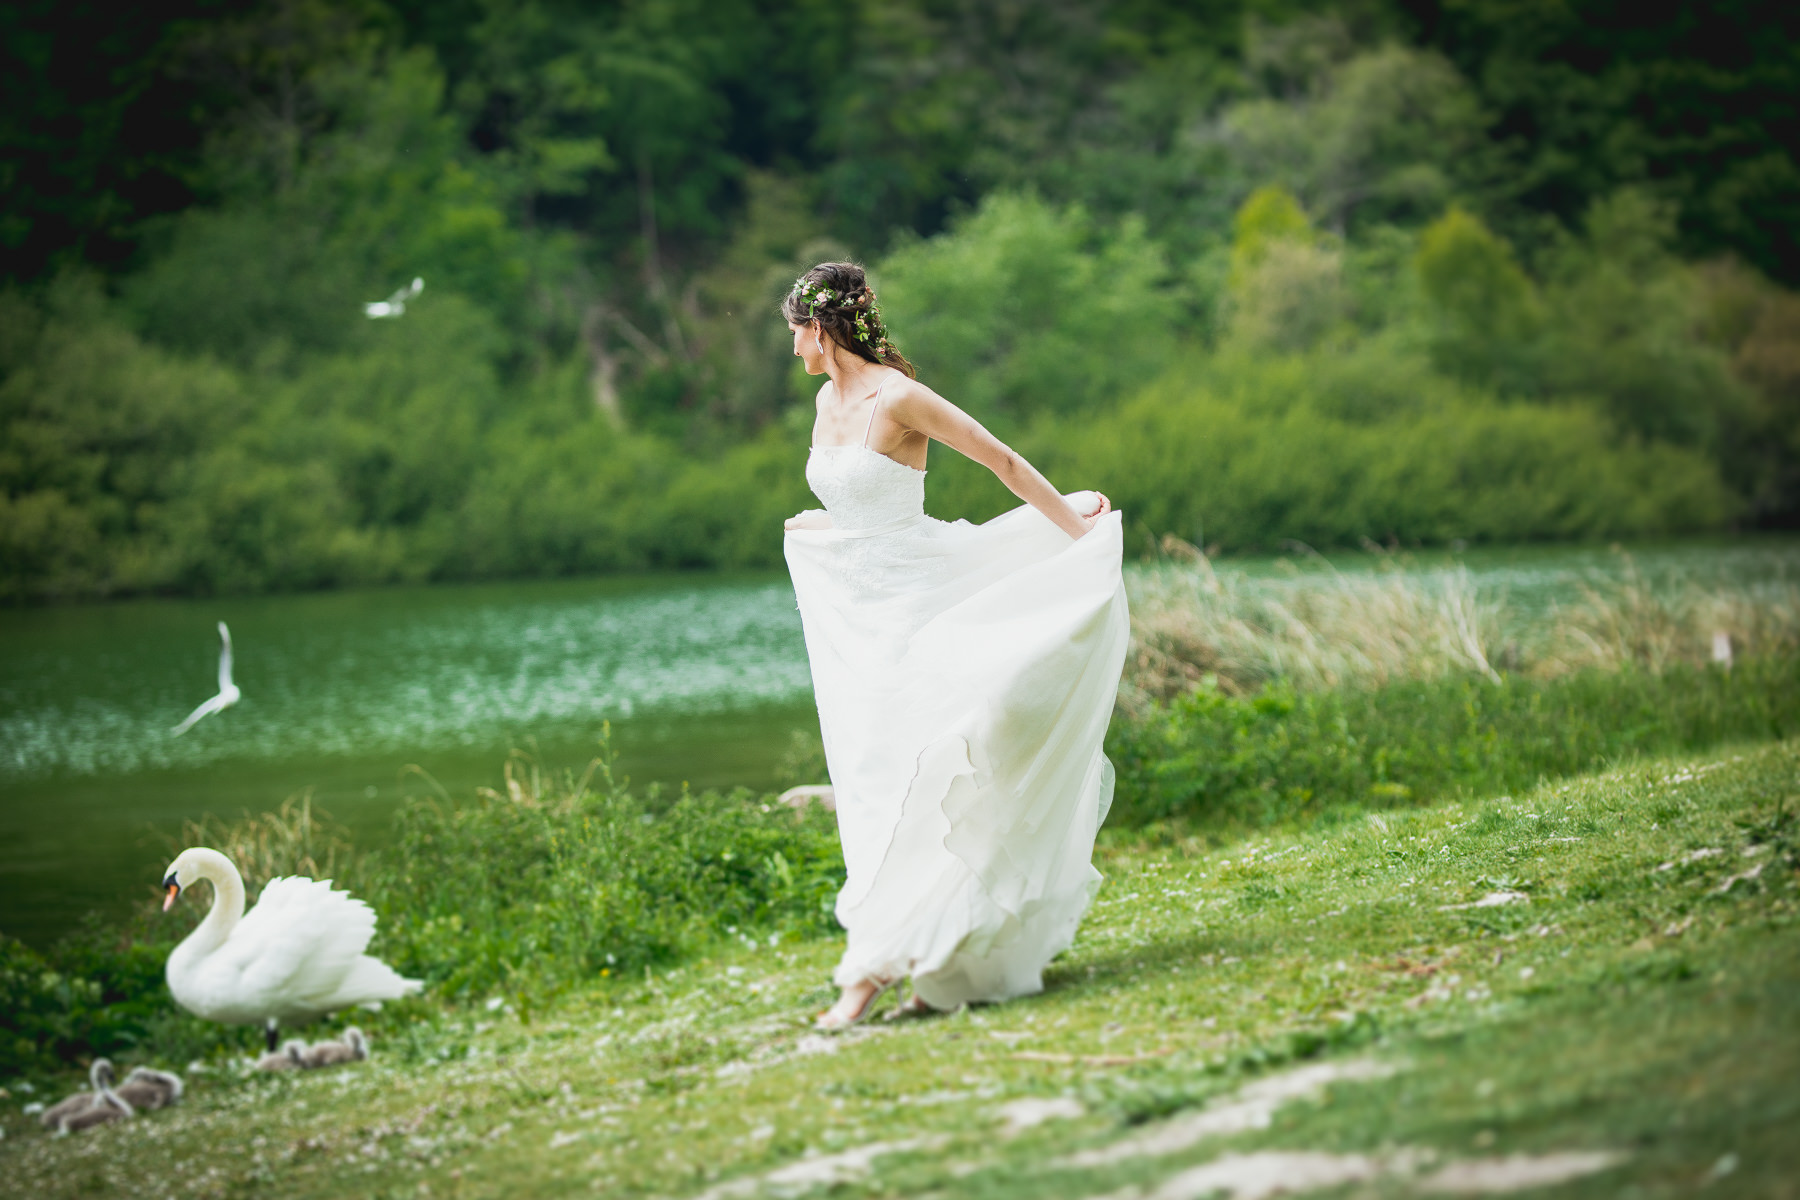 Bride and Swan Dance near the pond Vilcinskaite Photo